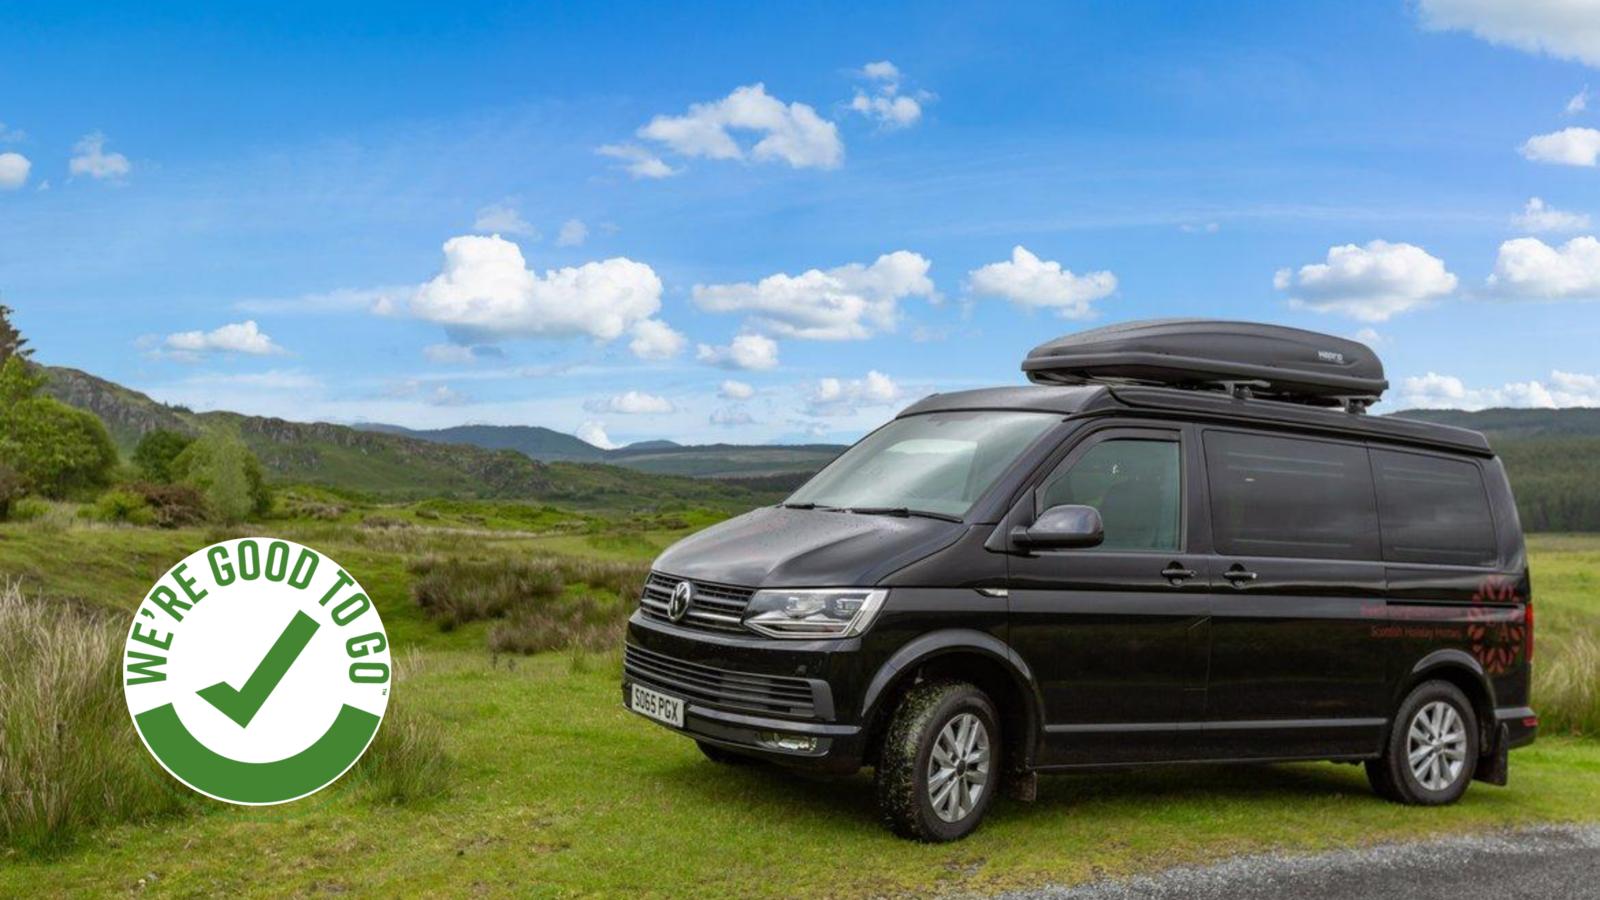 Bonnie the Campervan - Hire campervan Edinburgh - Explore Scotland with your own upgraded luxury Campervan